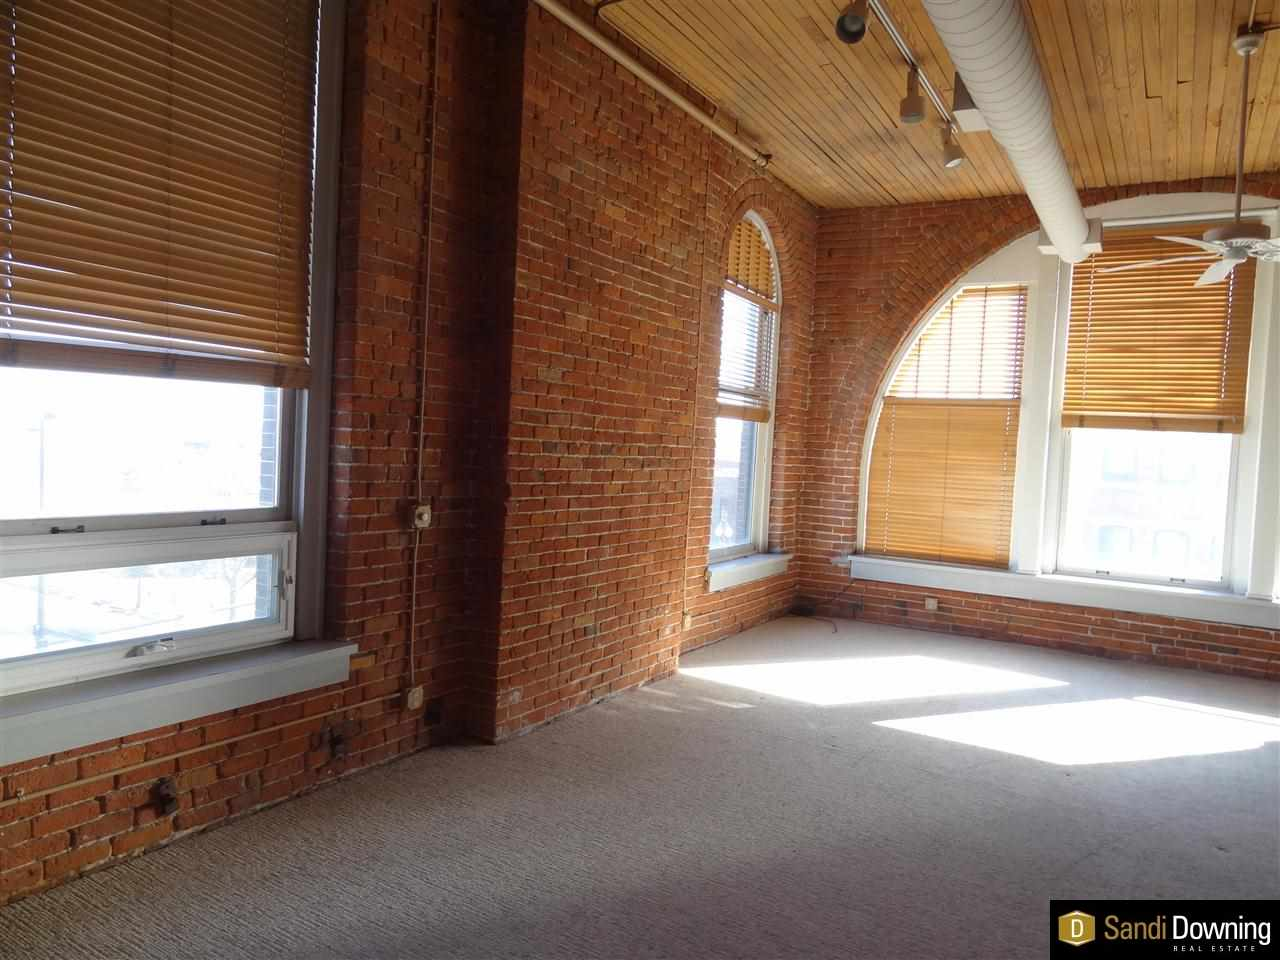 Rental Homes for Rent, ListingId:31718293, location: 314 S 11 Omaha 68102